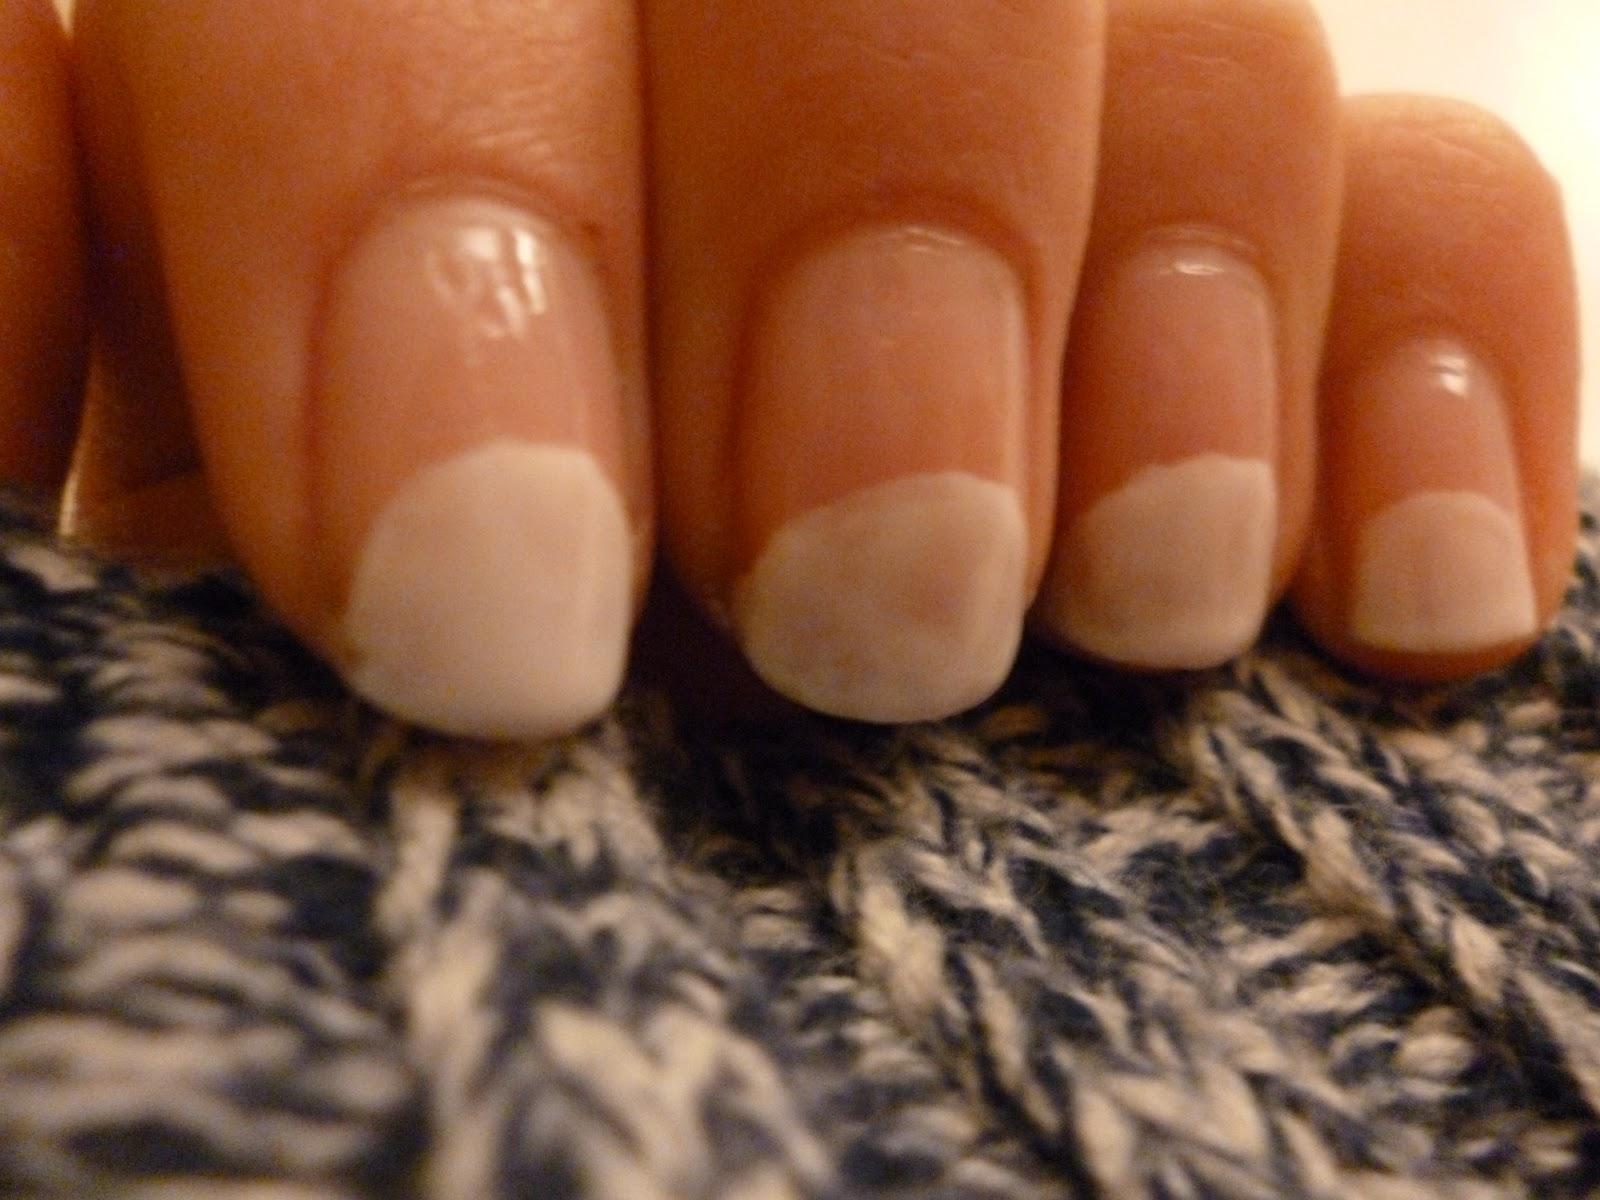 Onwijs Nail art by Sabine: Nail-art voor beginners: Panda nagels! PQ-55